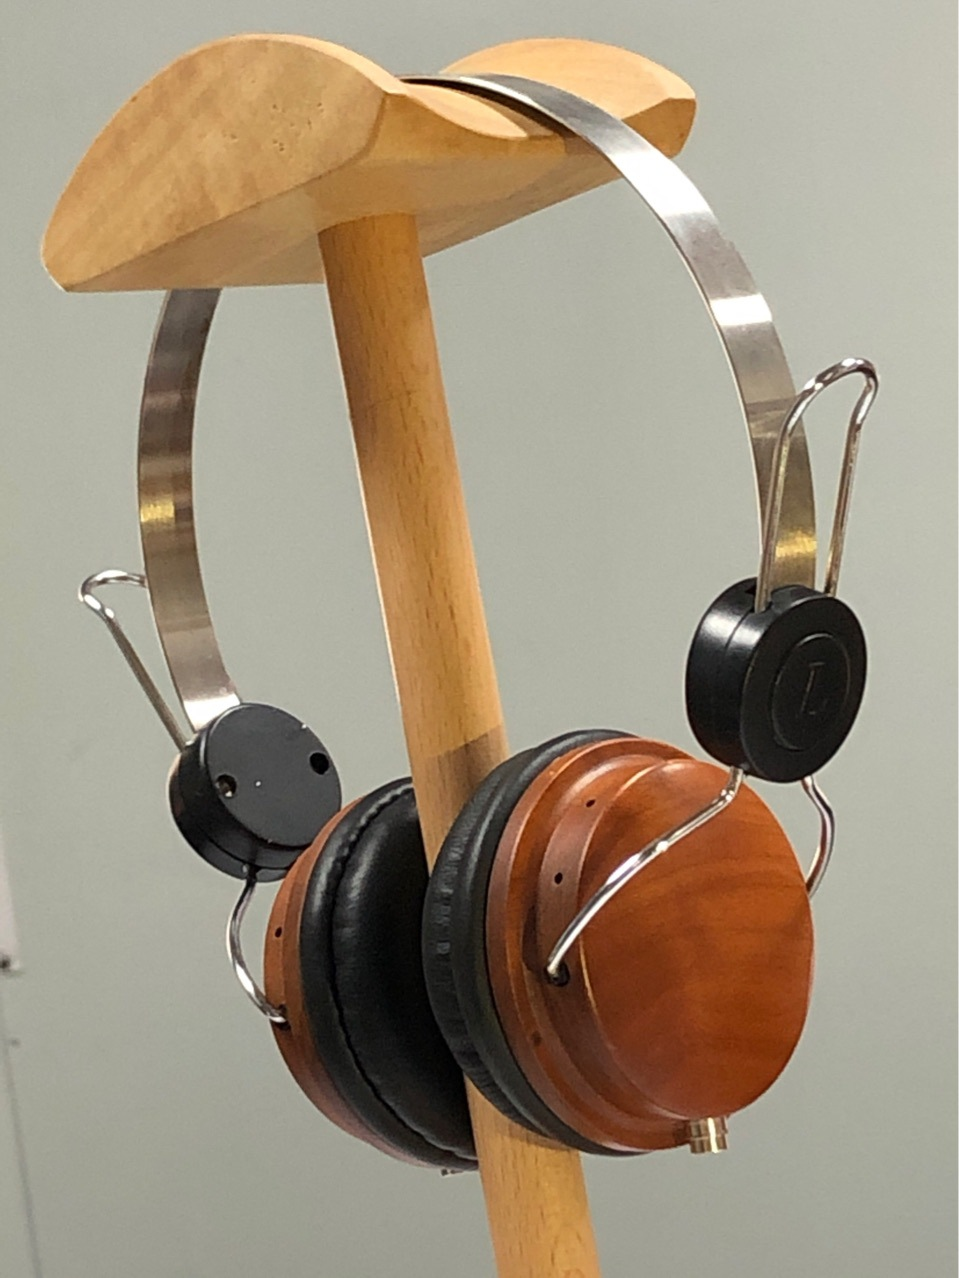 Casque bois massif casque stéréo casque bois cerise casque shell bricolage casque HiFi